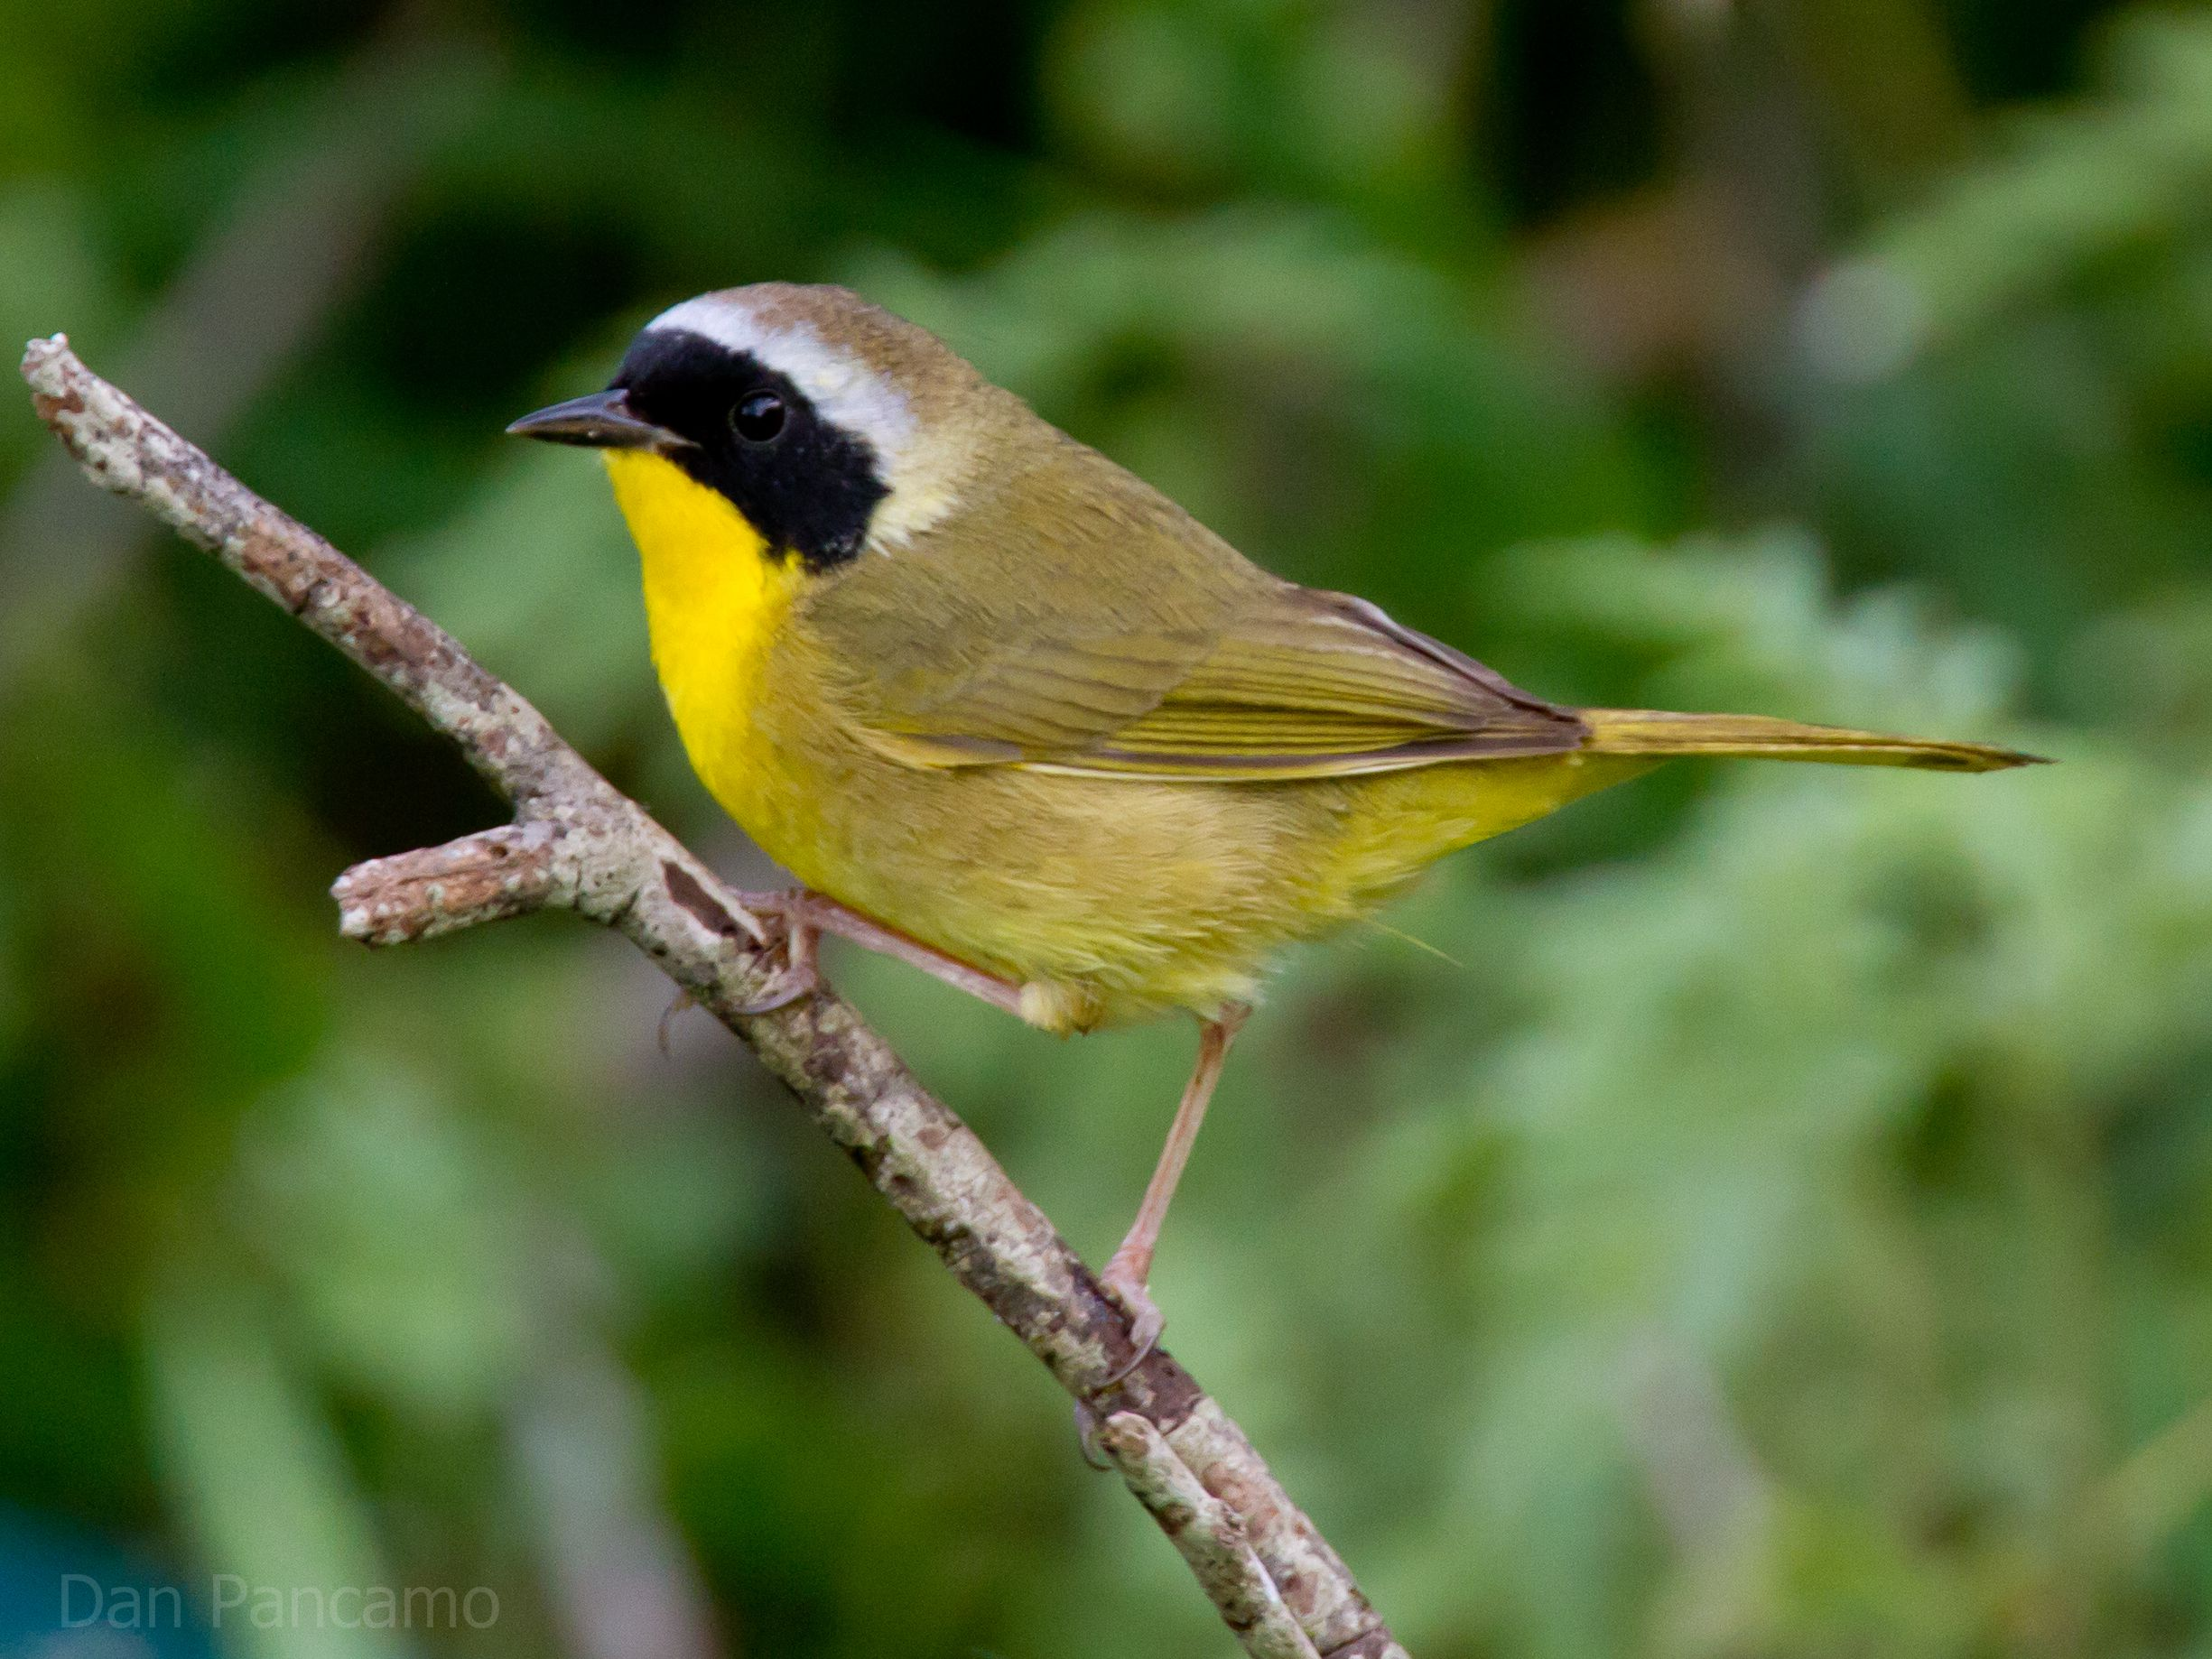 black bird with yellow stripe